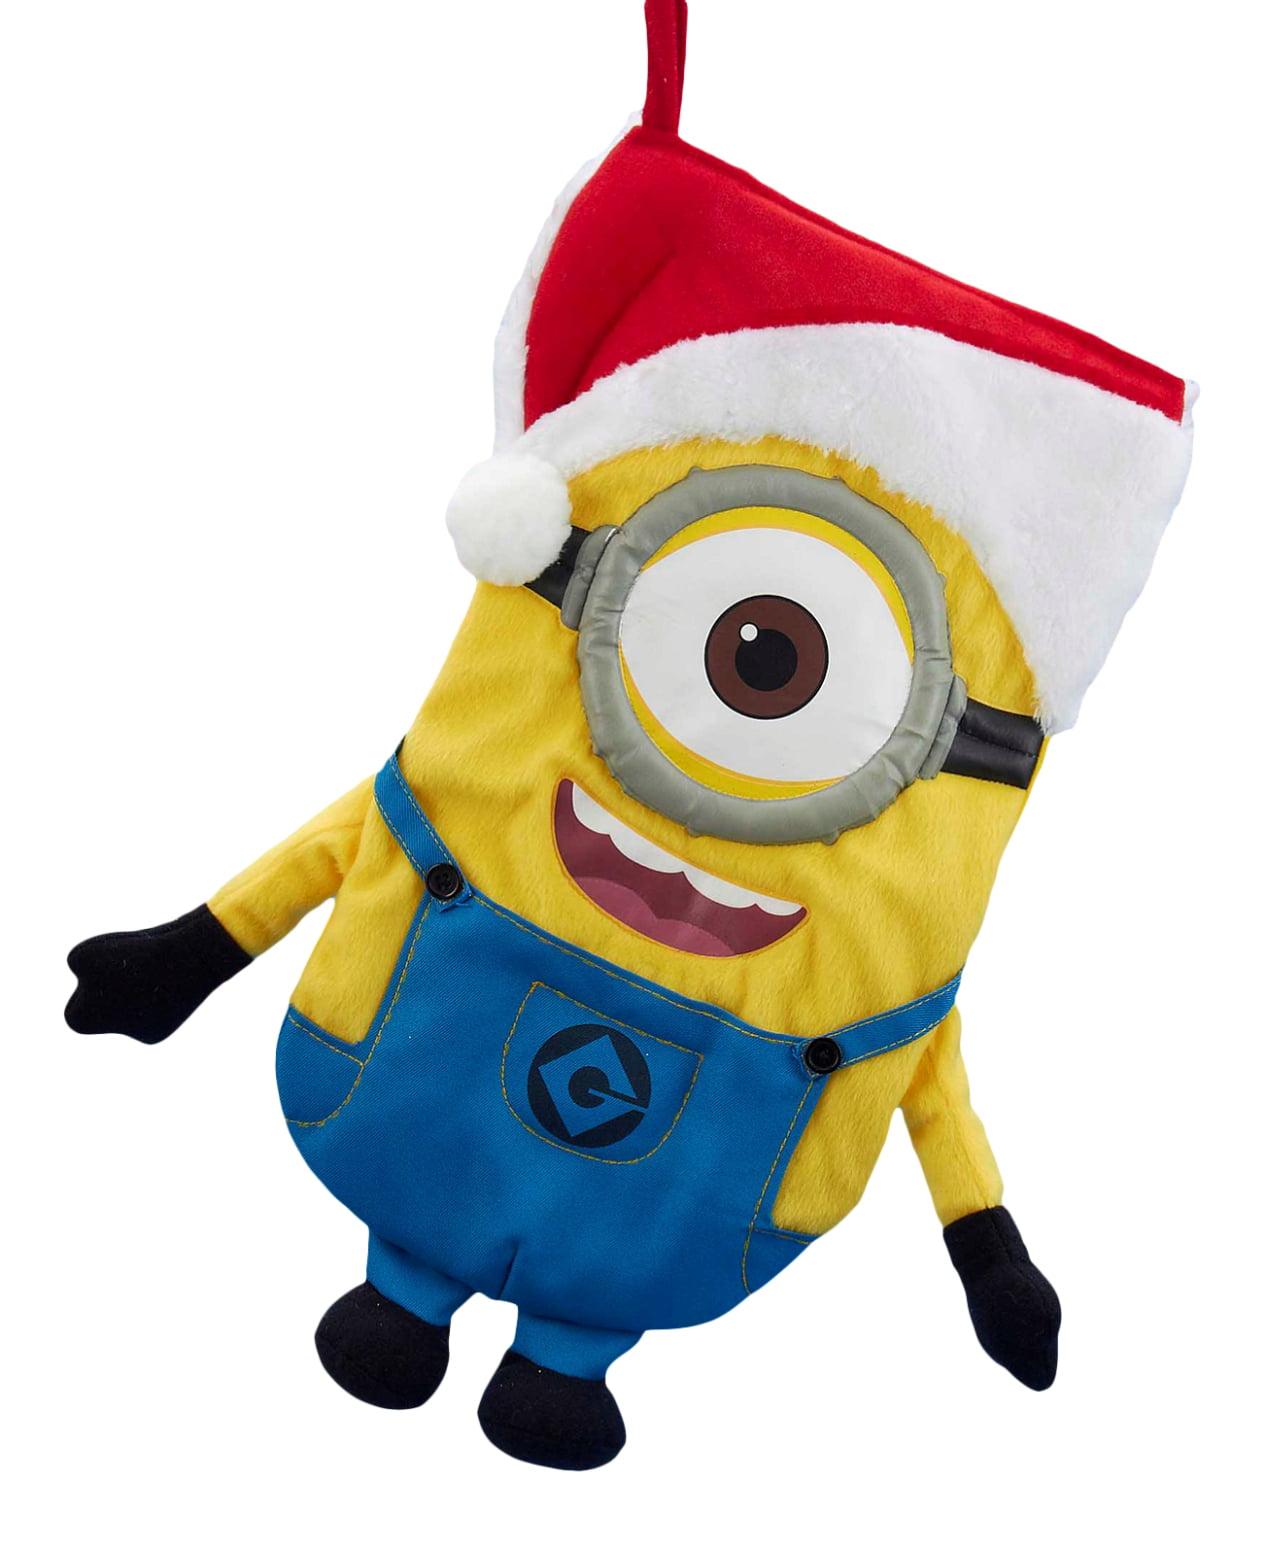 Despicable Me Stuart The Minion With Santa Hat Plush Christmas